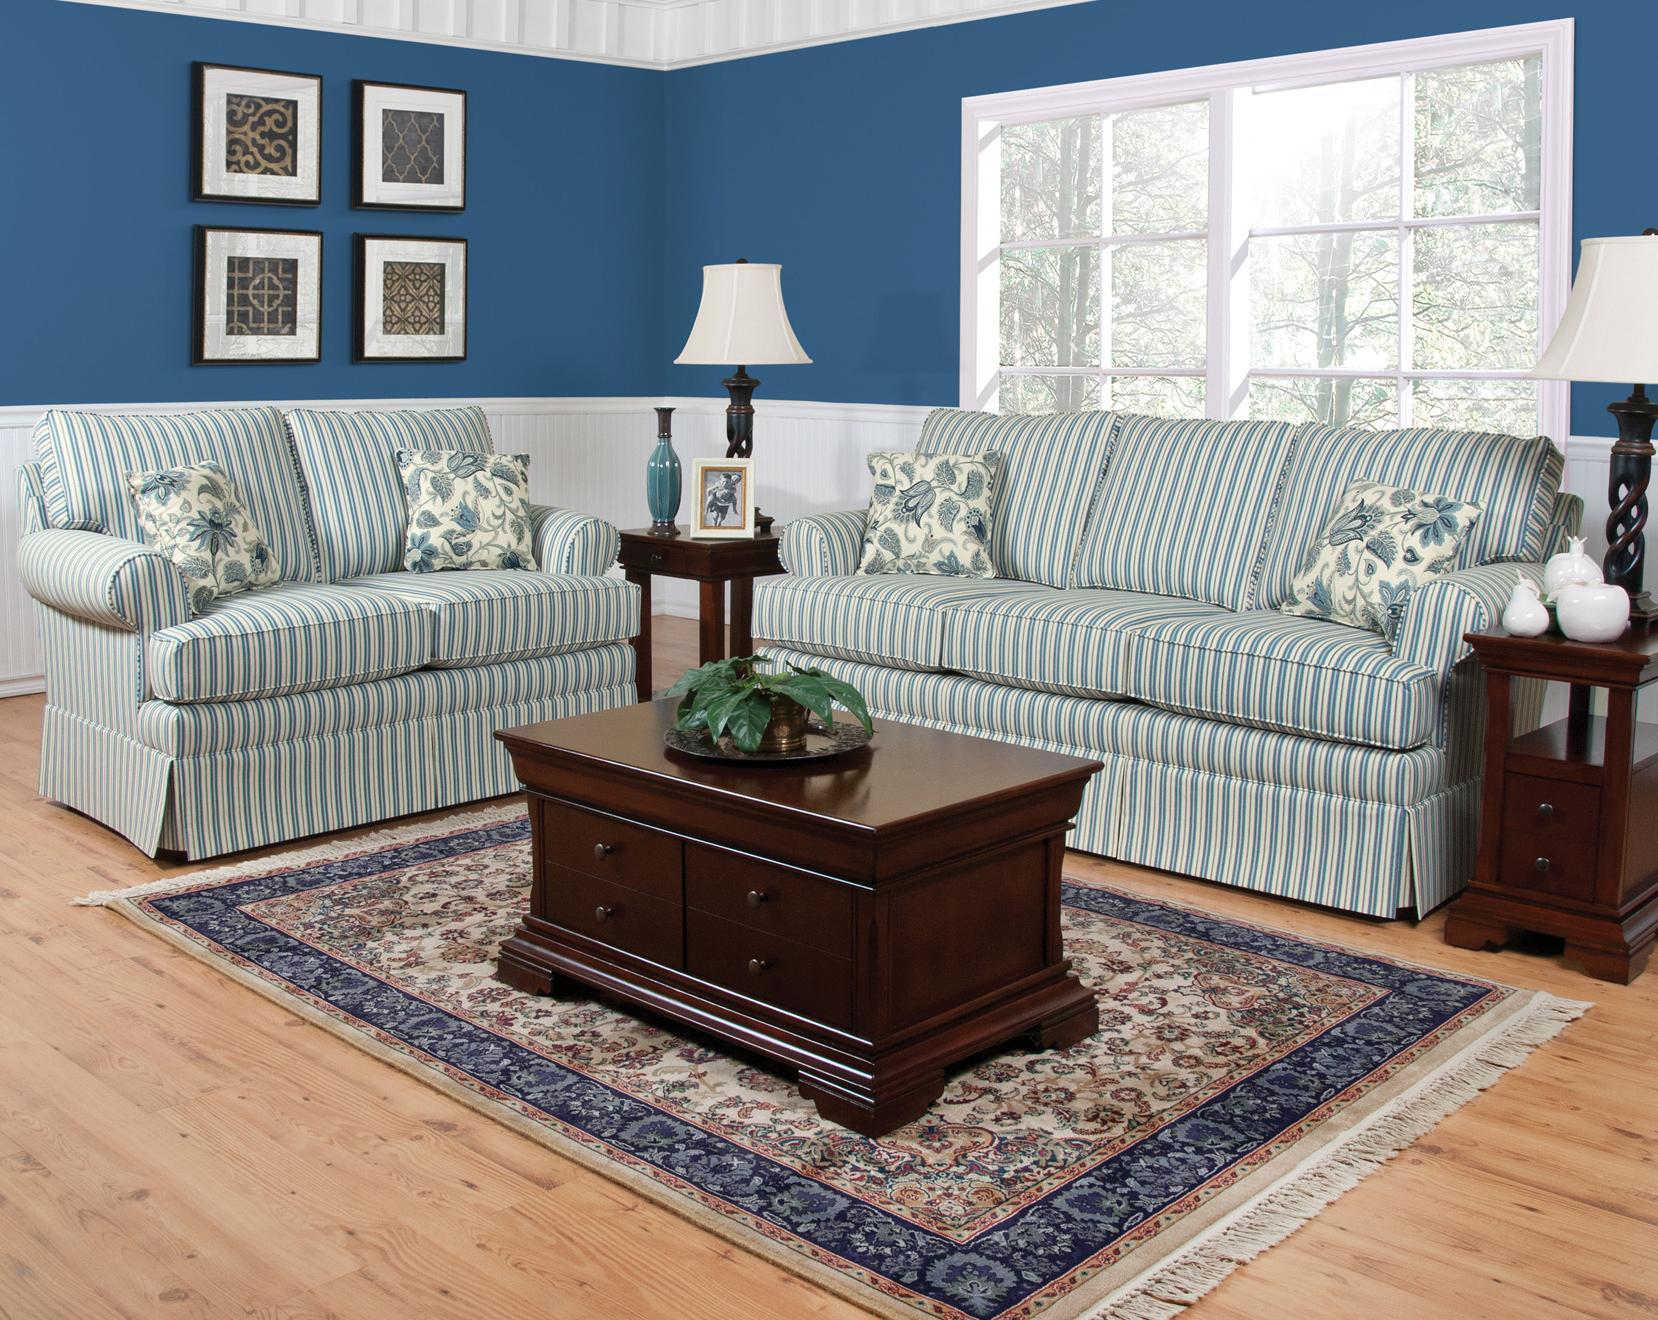 England Grace Visco Mattress Full Size Sofa Sleeper With